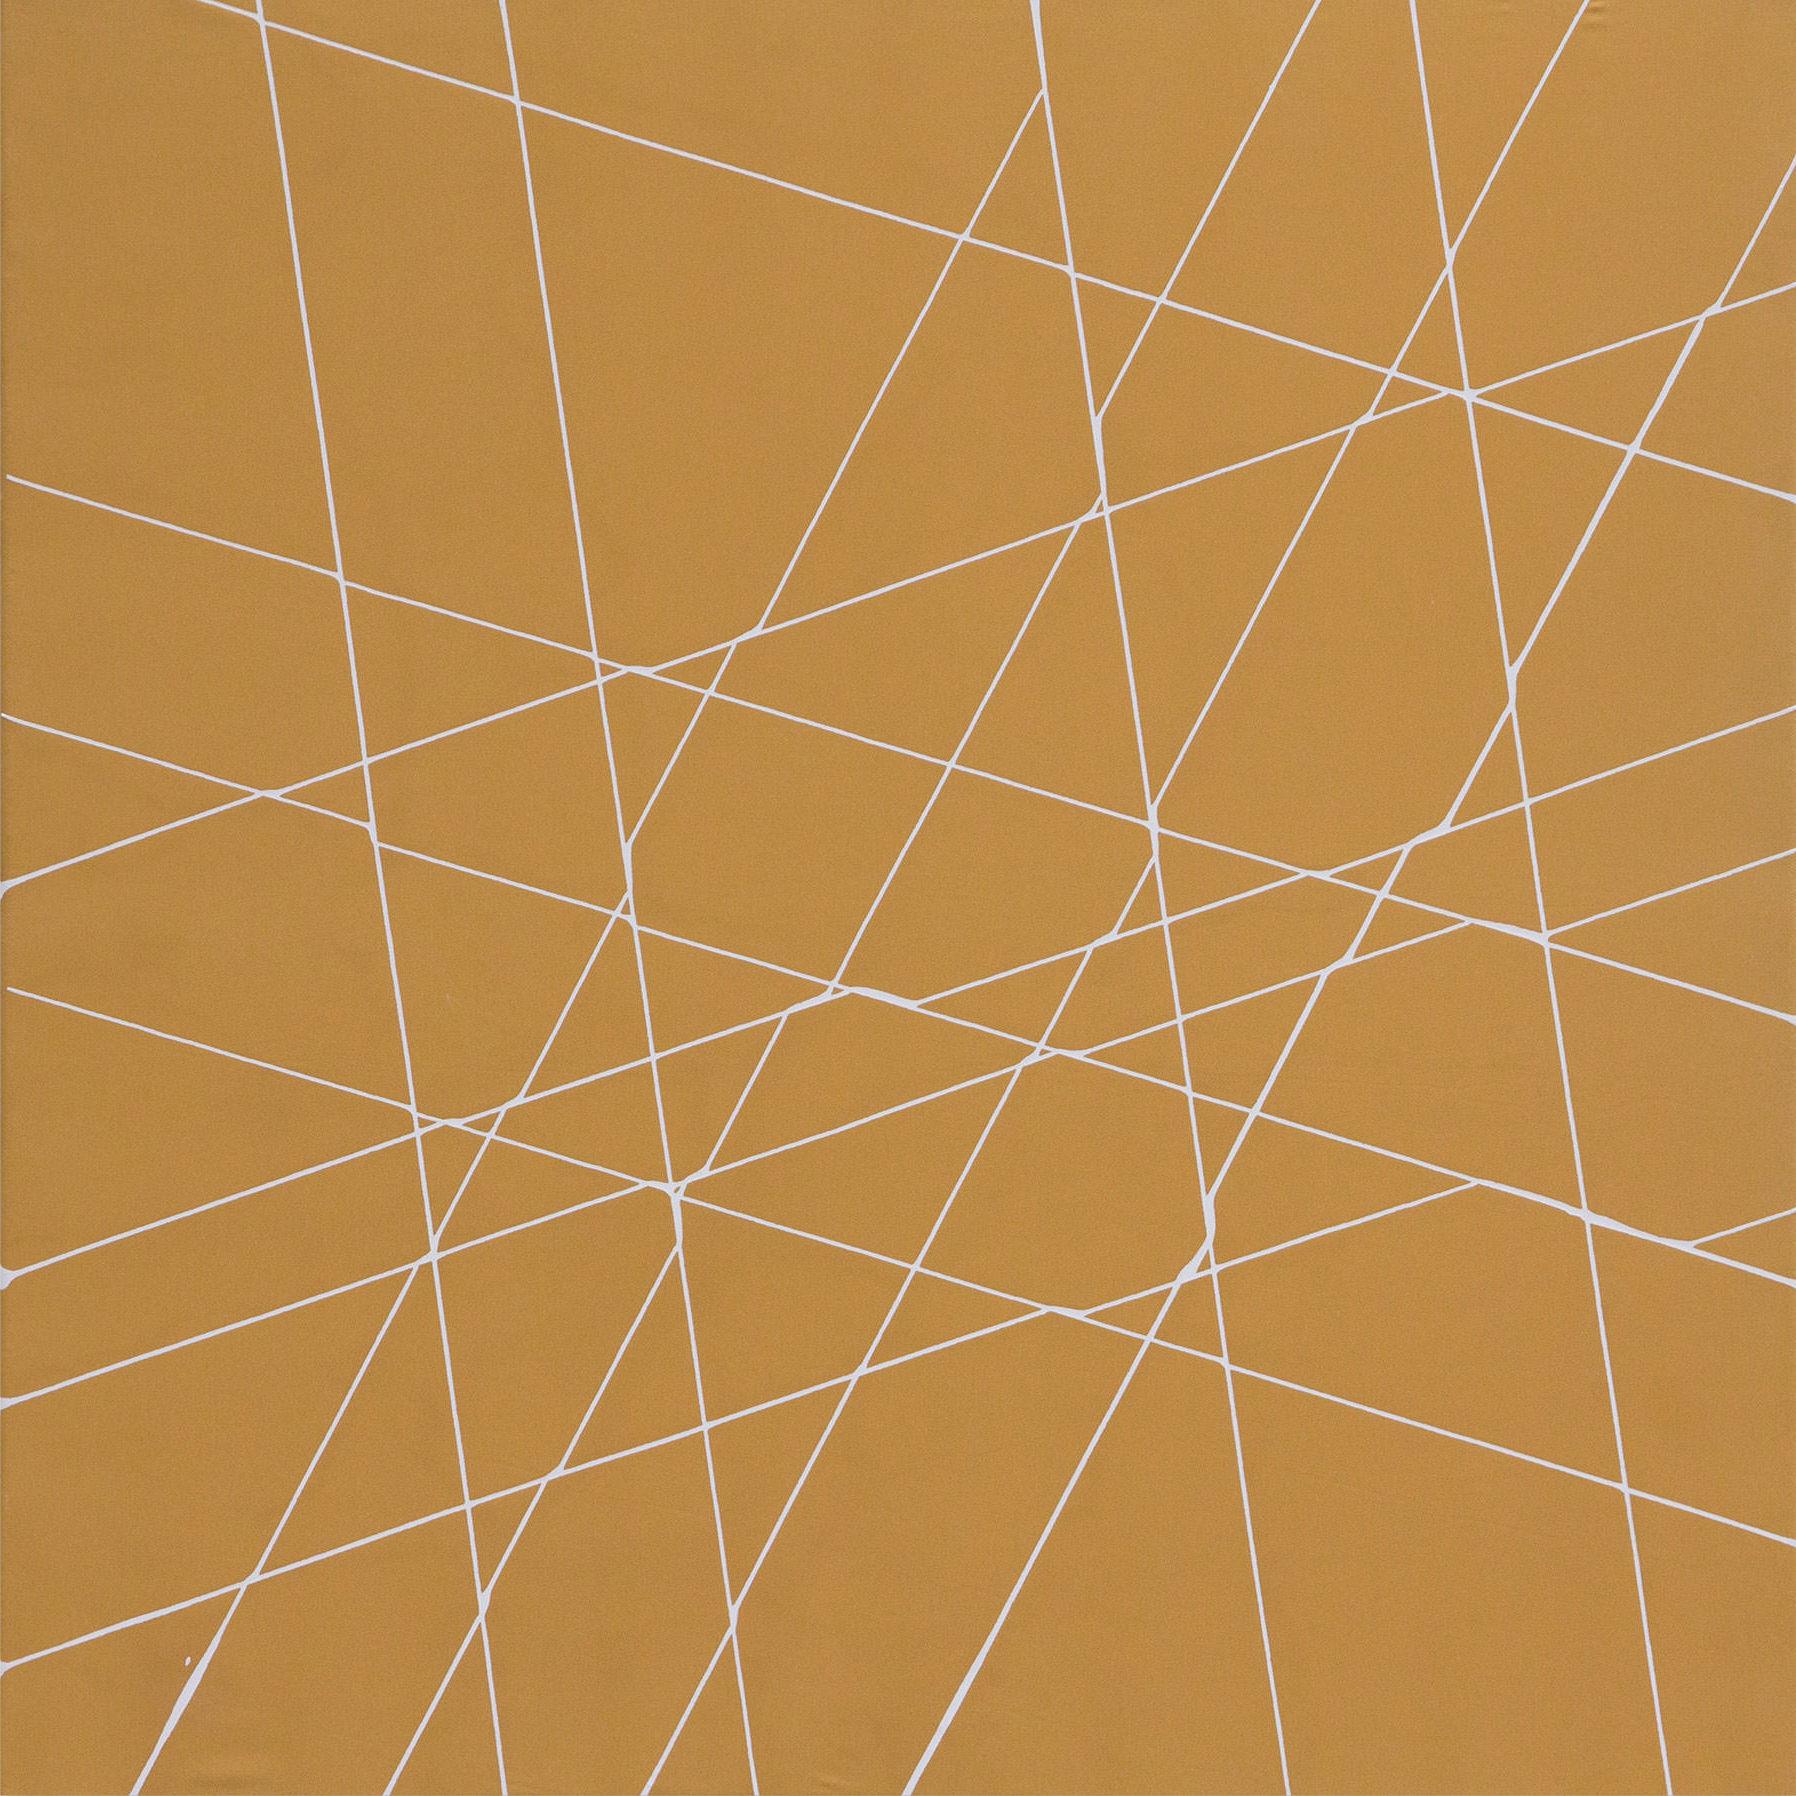 Trail 06, 2016, Acryllack auf Polyester, 70 x 70 cm